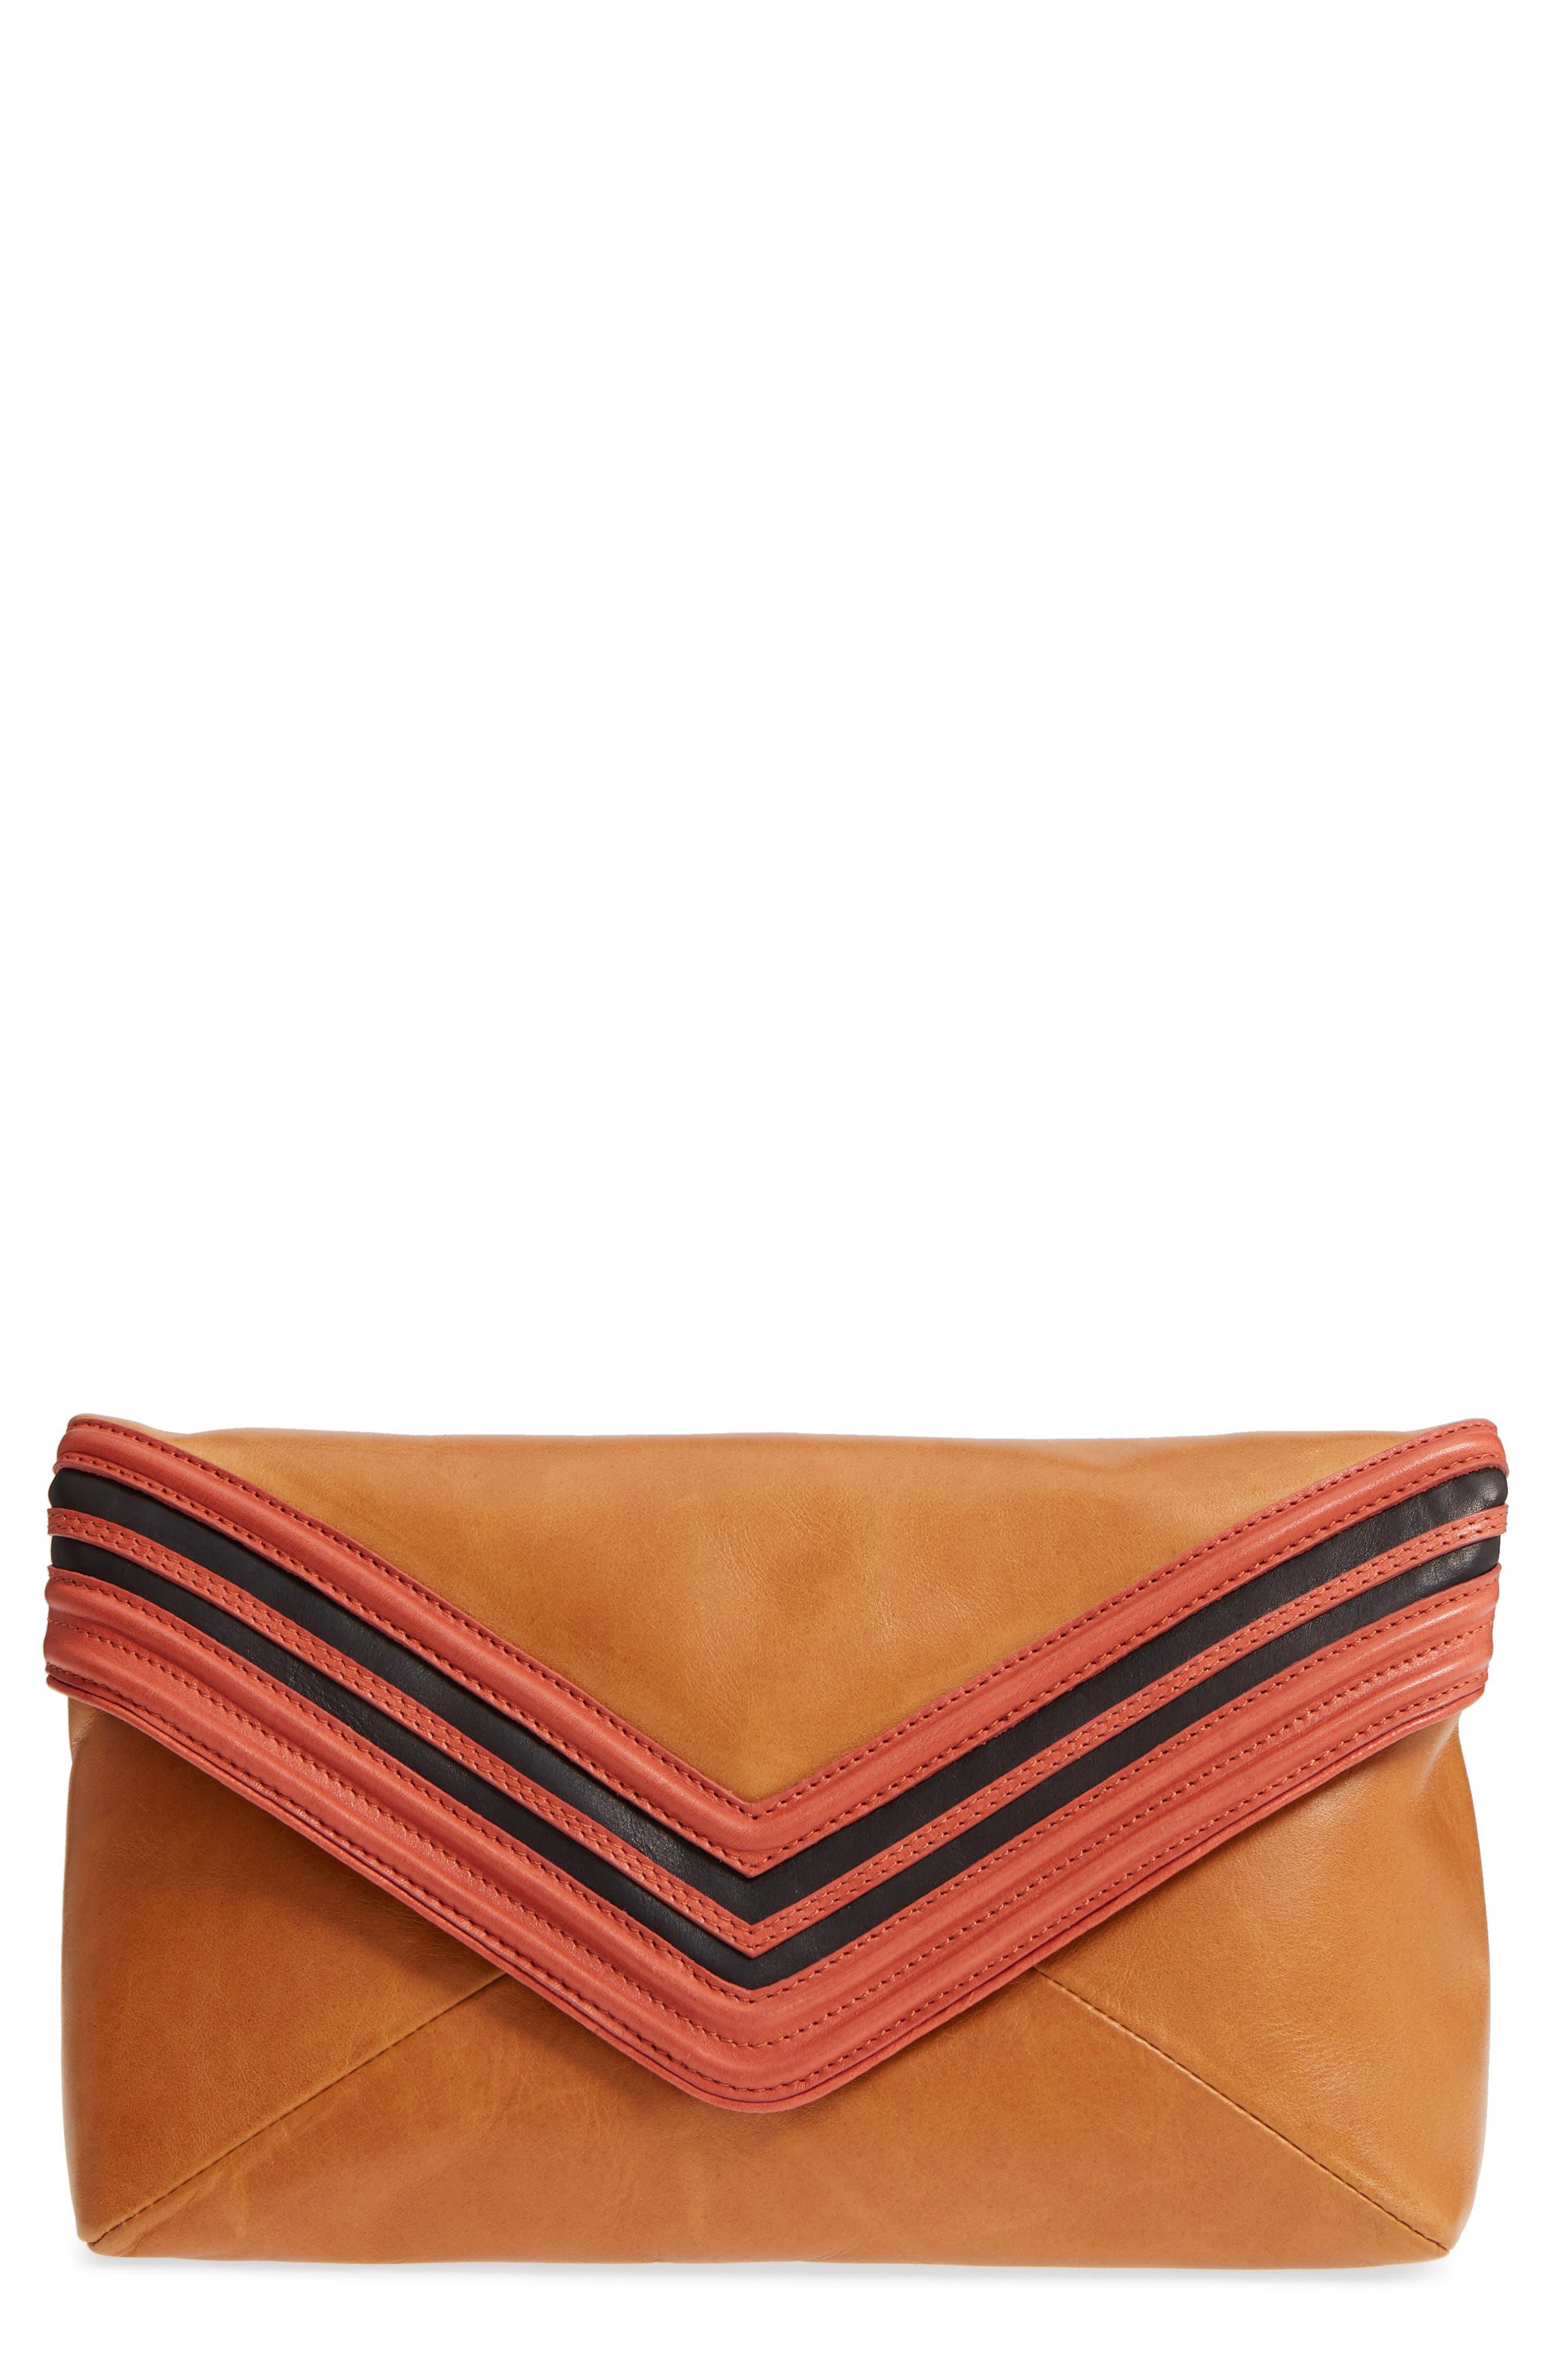 Leather Envelope Clutch,                             Main thumbnail 1, color,                             Camel